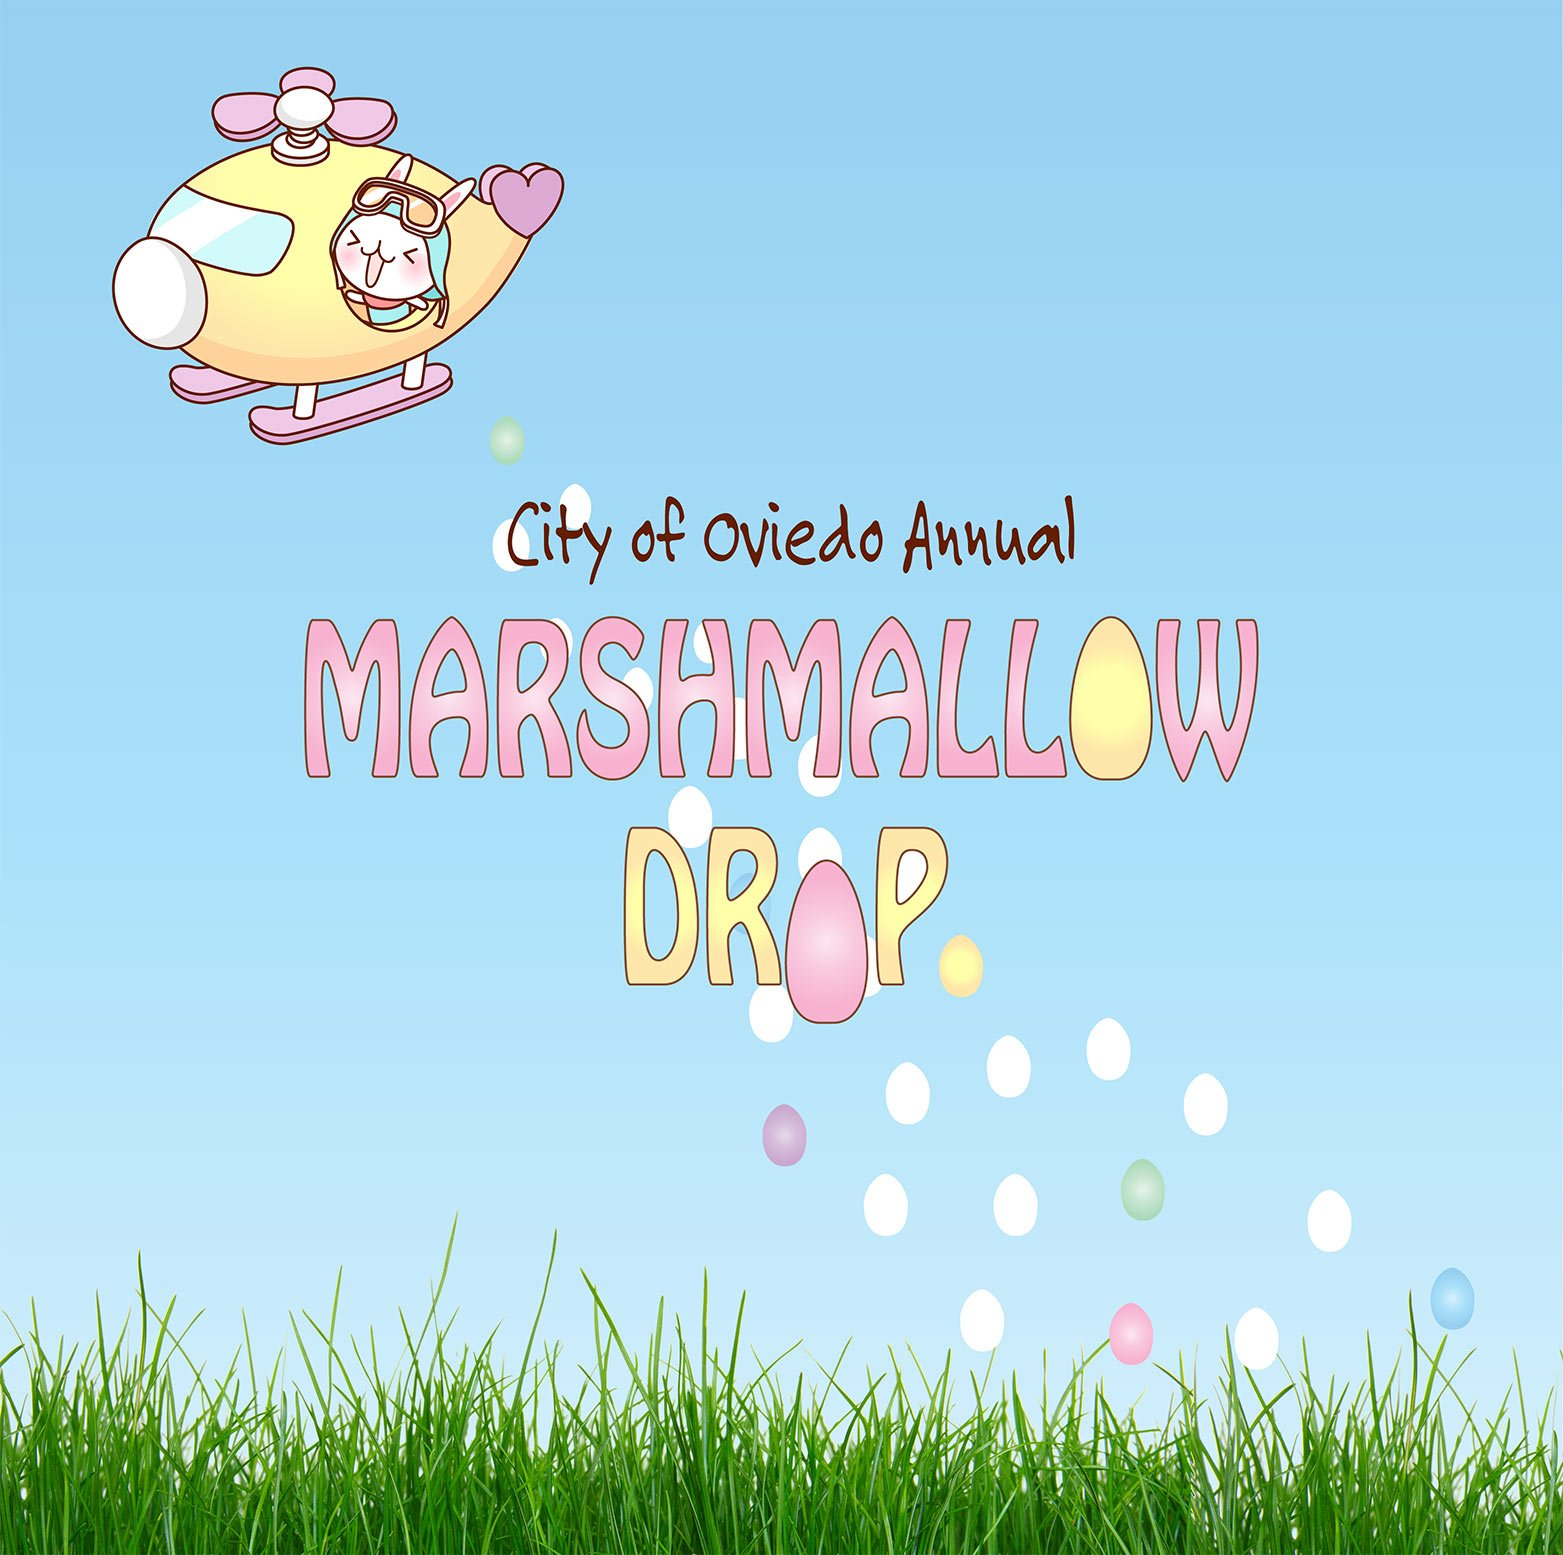 Marshmallow-Drop-FB-Ad-03